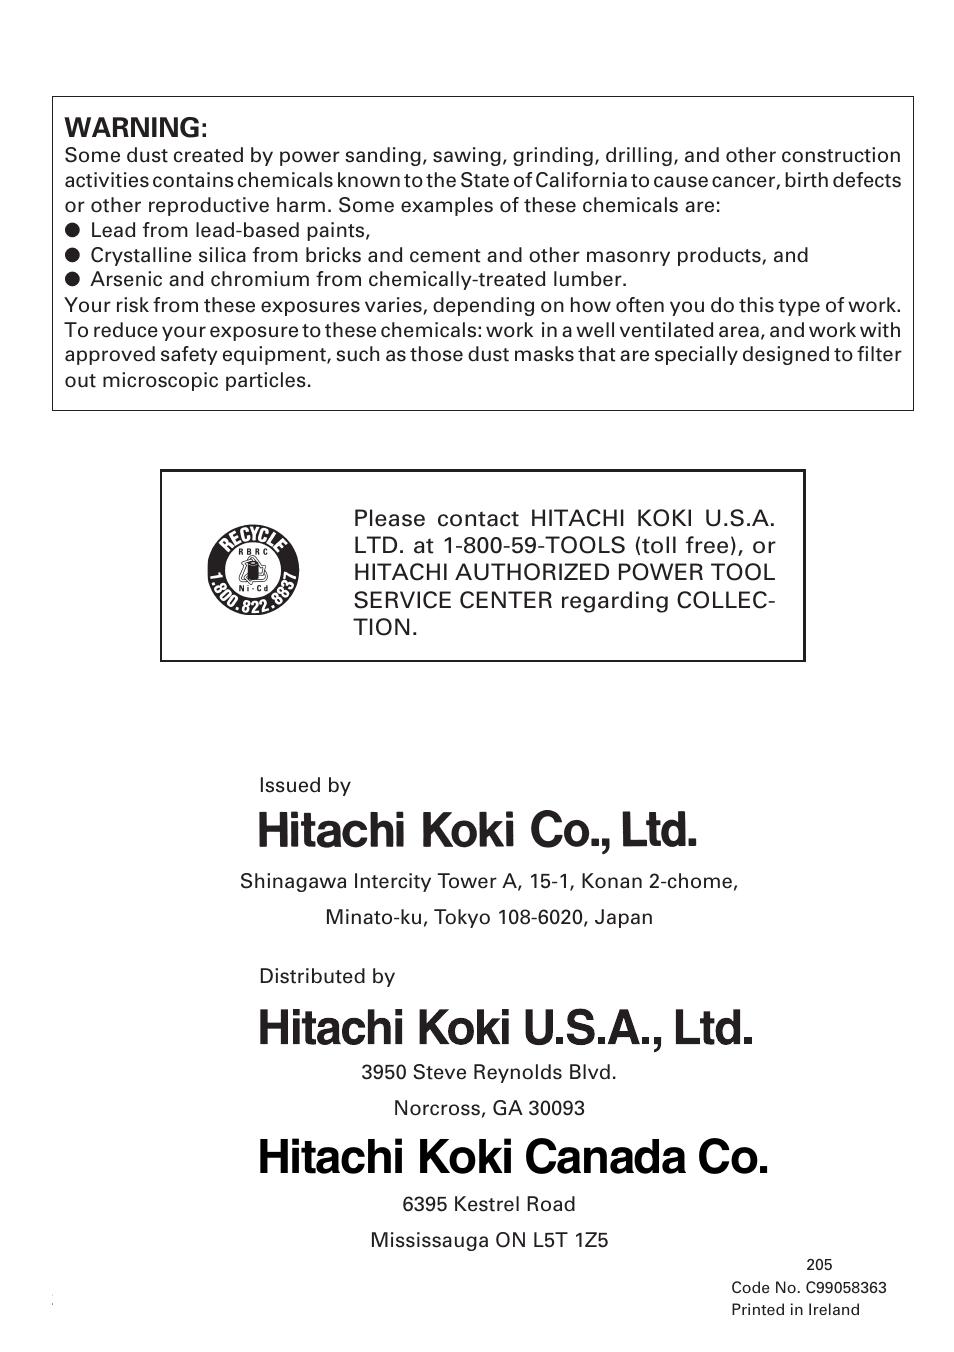 Hitachi koki canada co, Warning | Honeywell DN 10DY User